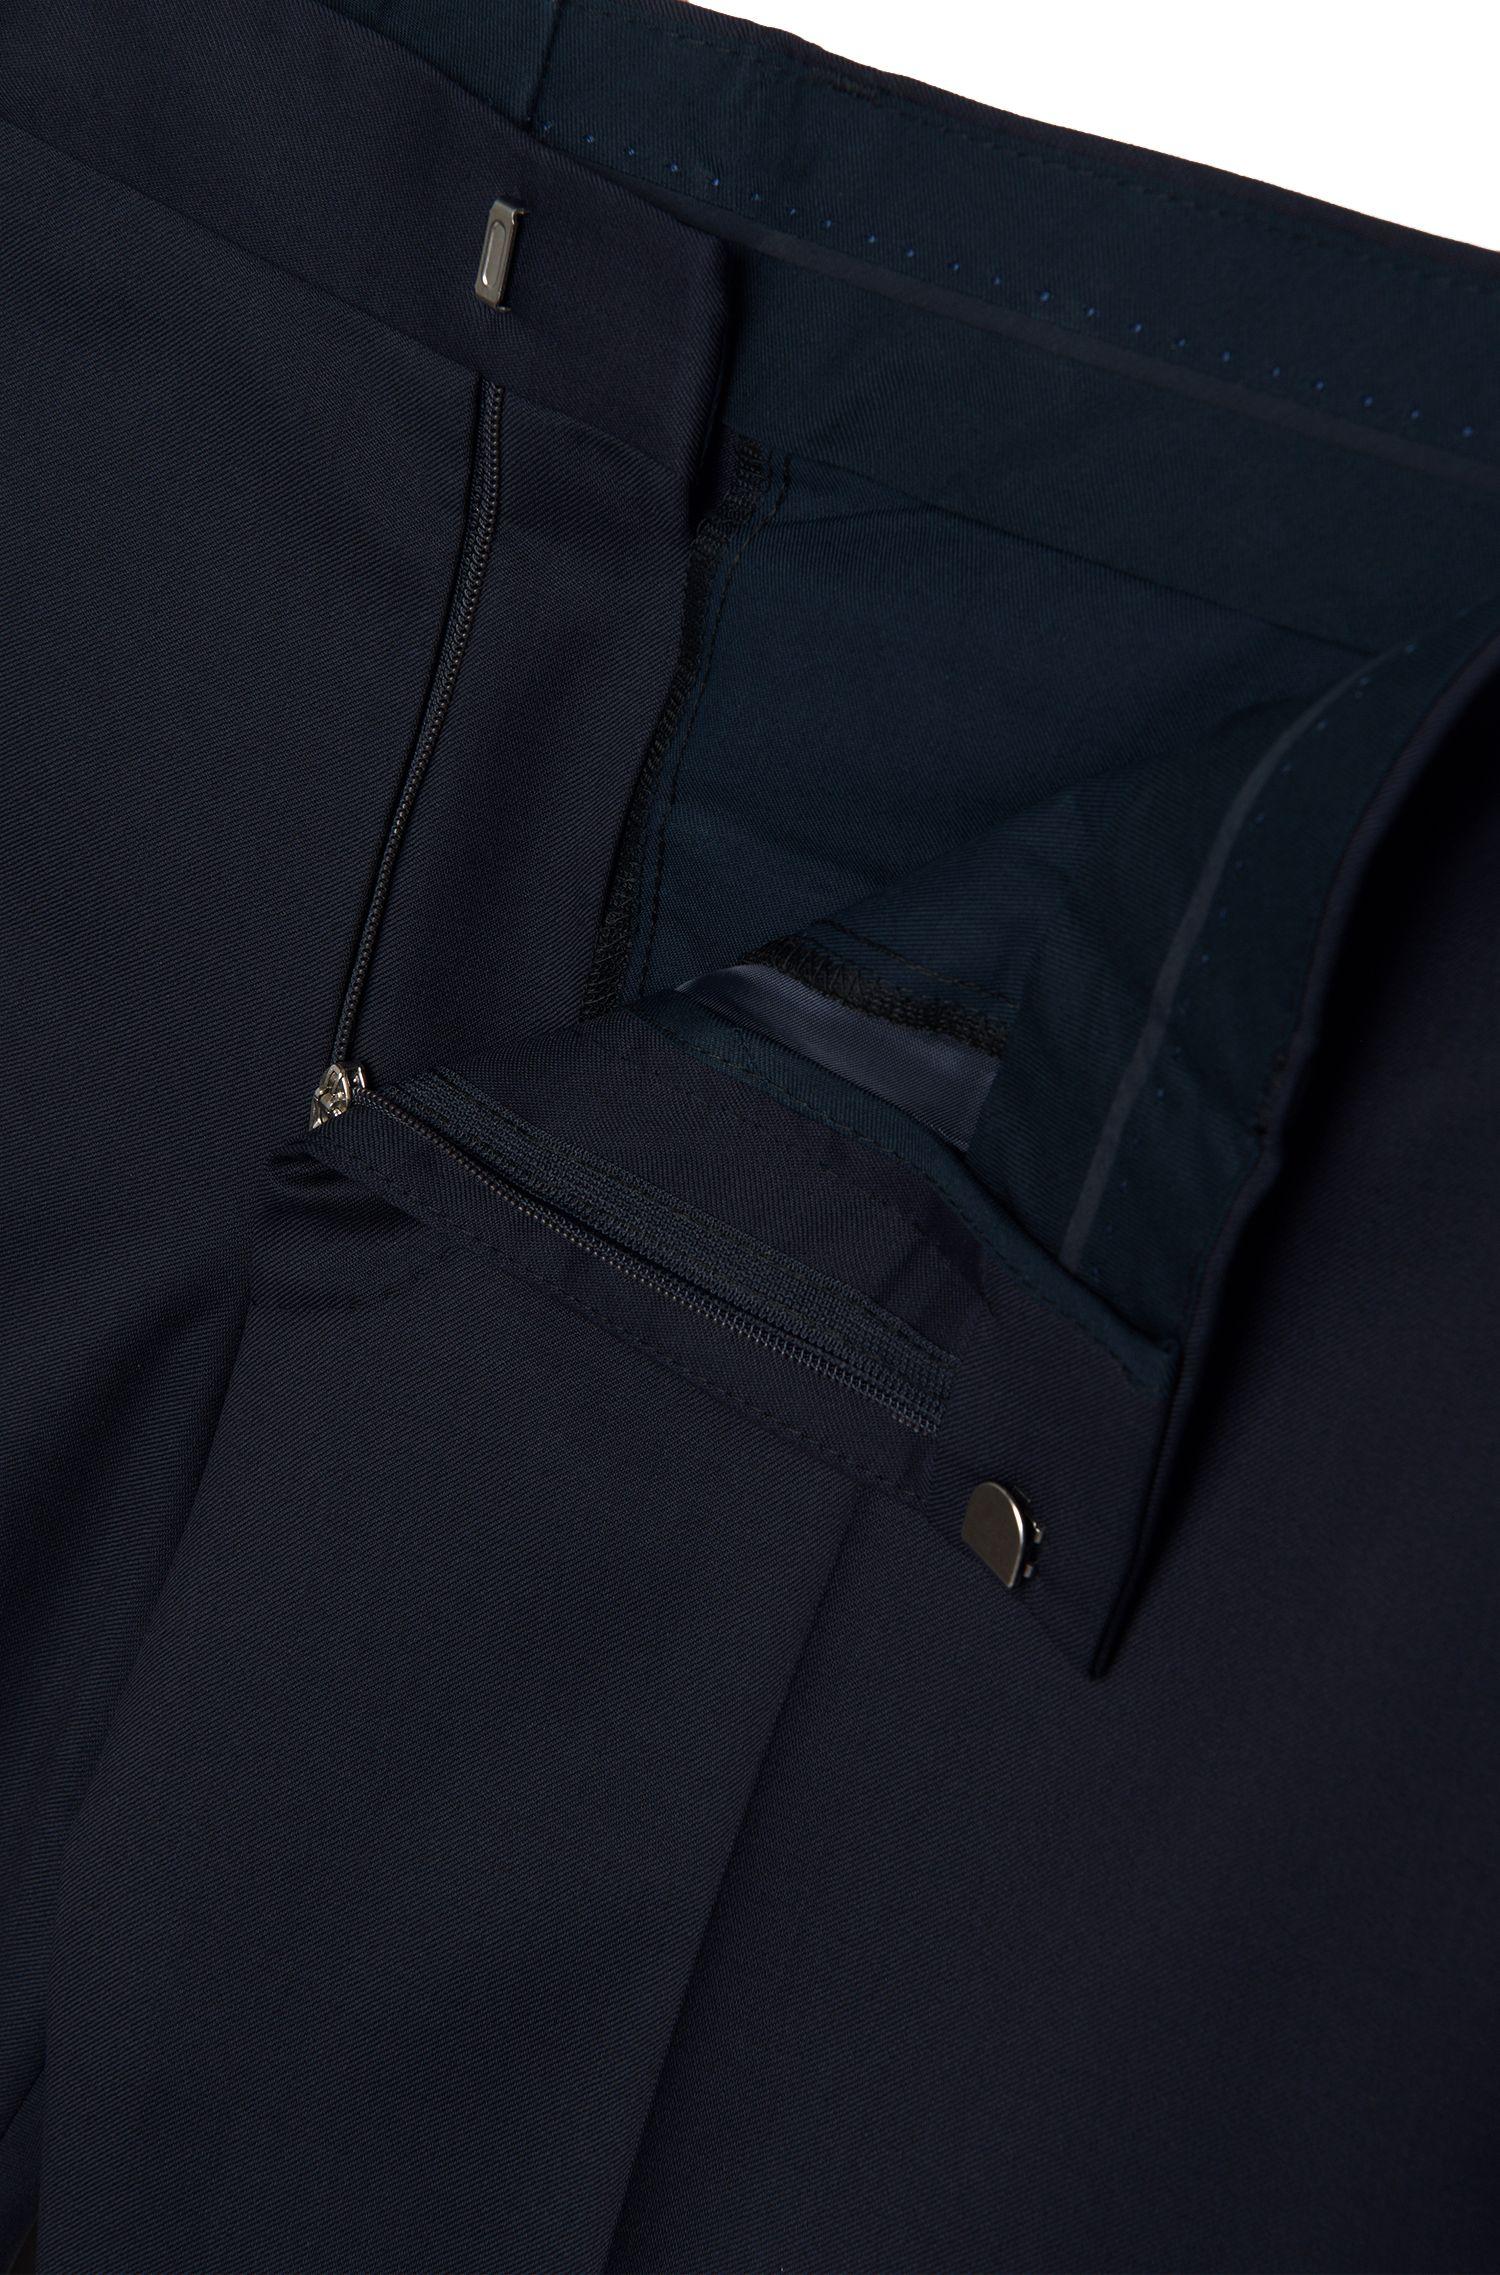 Virgin Wool Dress Pants, Slim Fit | Gibson CYL